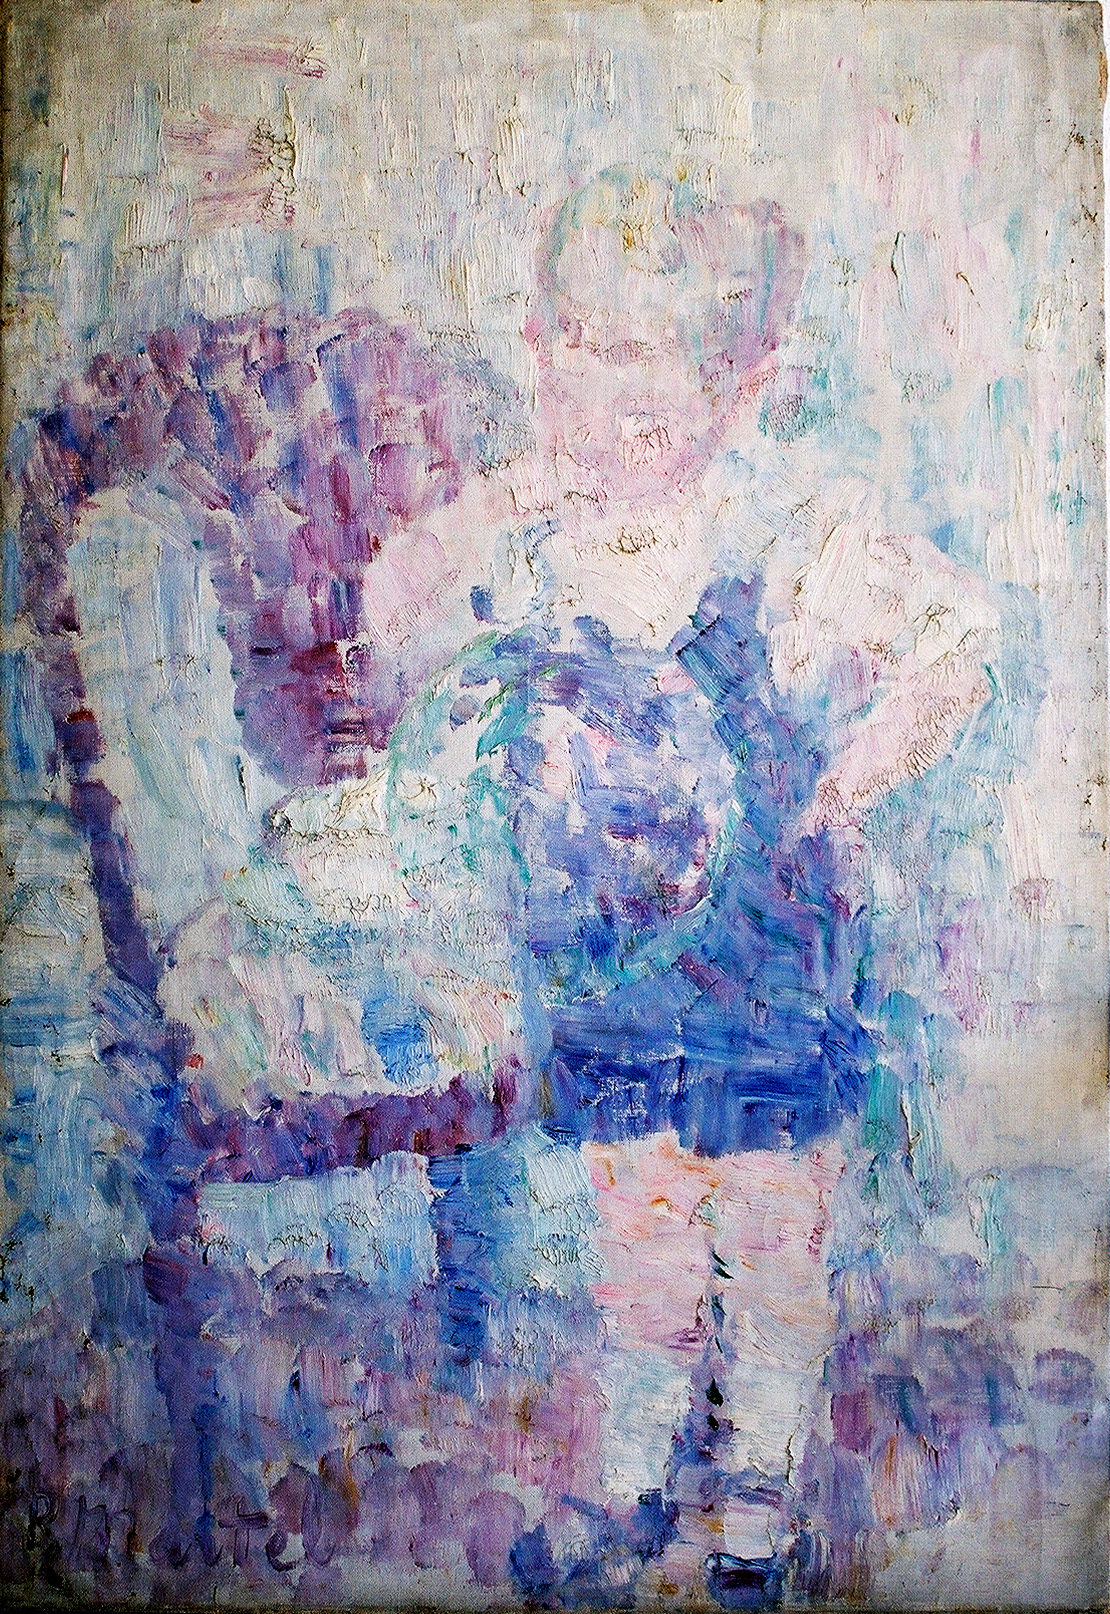 """Bubble Boy"" !920-Oil on Canvas 14 1/2"" x 10 3/4"""